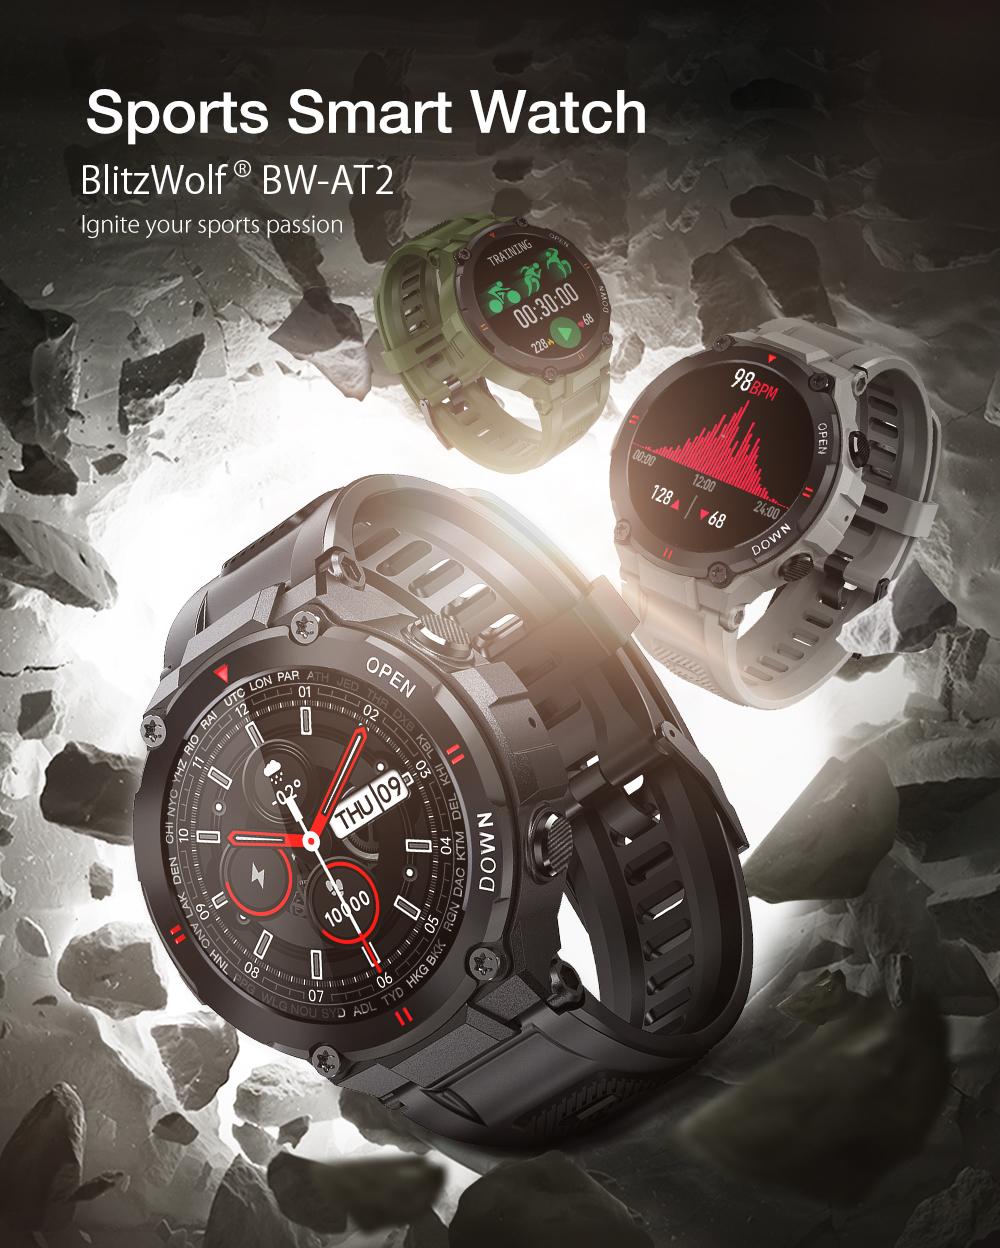 Blitzwolf BW-AT2 sport smart watch